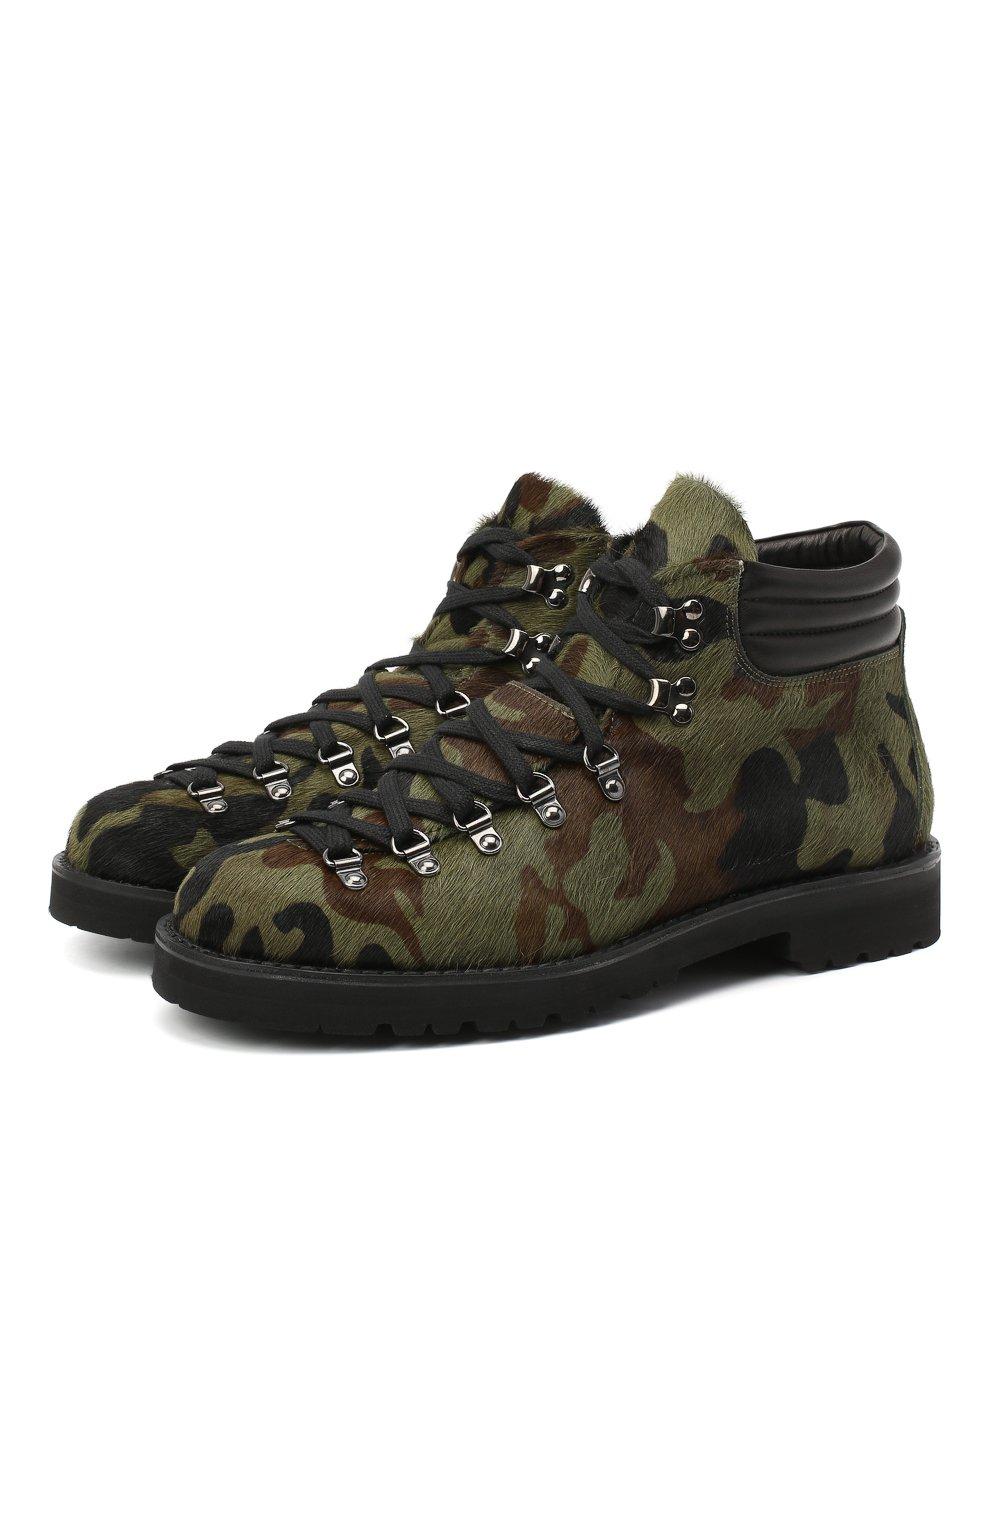 Мужские кожаные ботинки m127 FRACAP зеленого цвета, арт. M127/P0NY/IMB.NEBR./CALFSKIN/CANNA FUCILI/R0CCIA | Фото 1